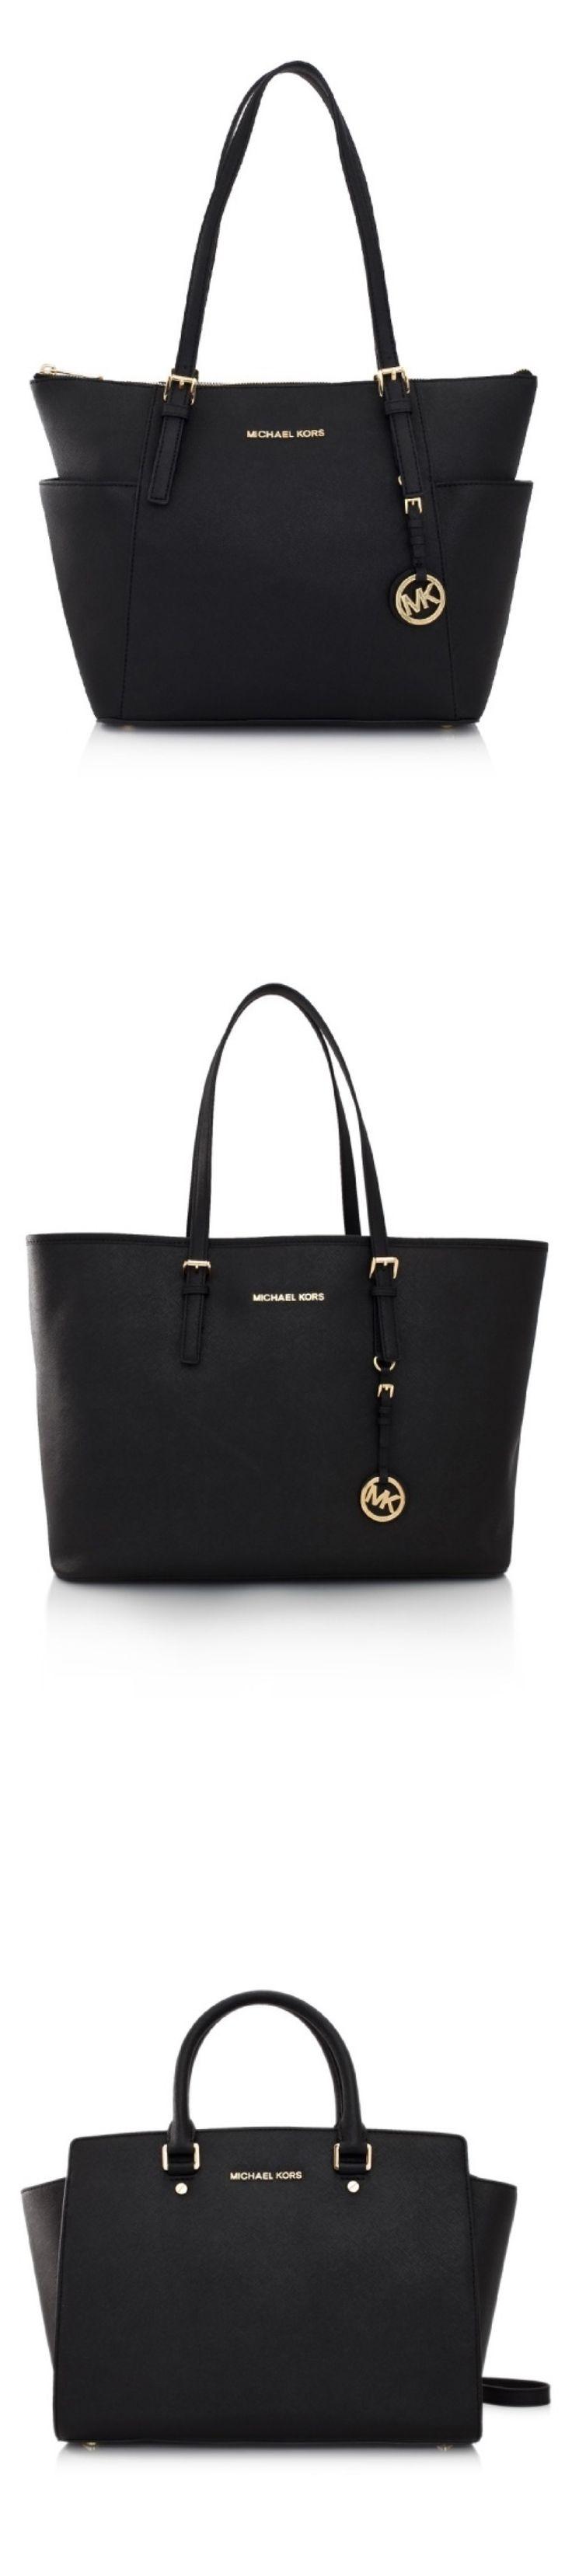 Micheal Kors handbags!